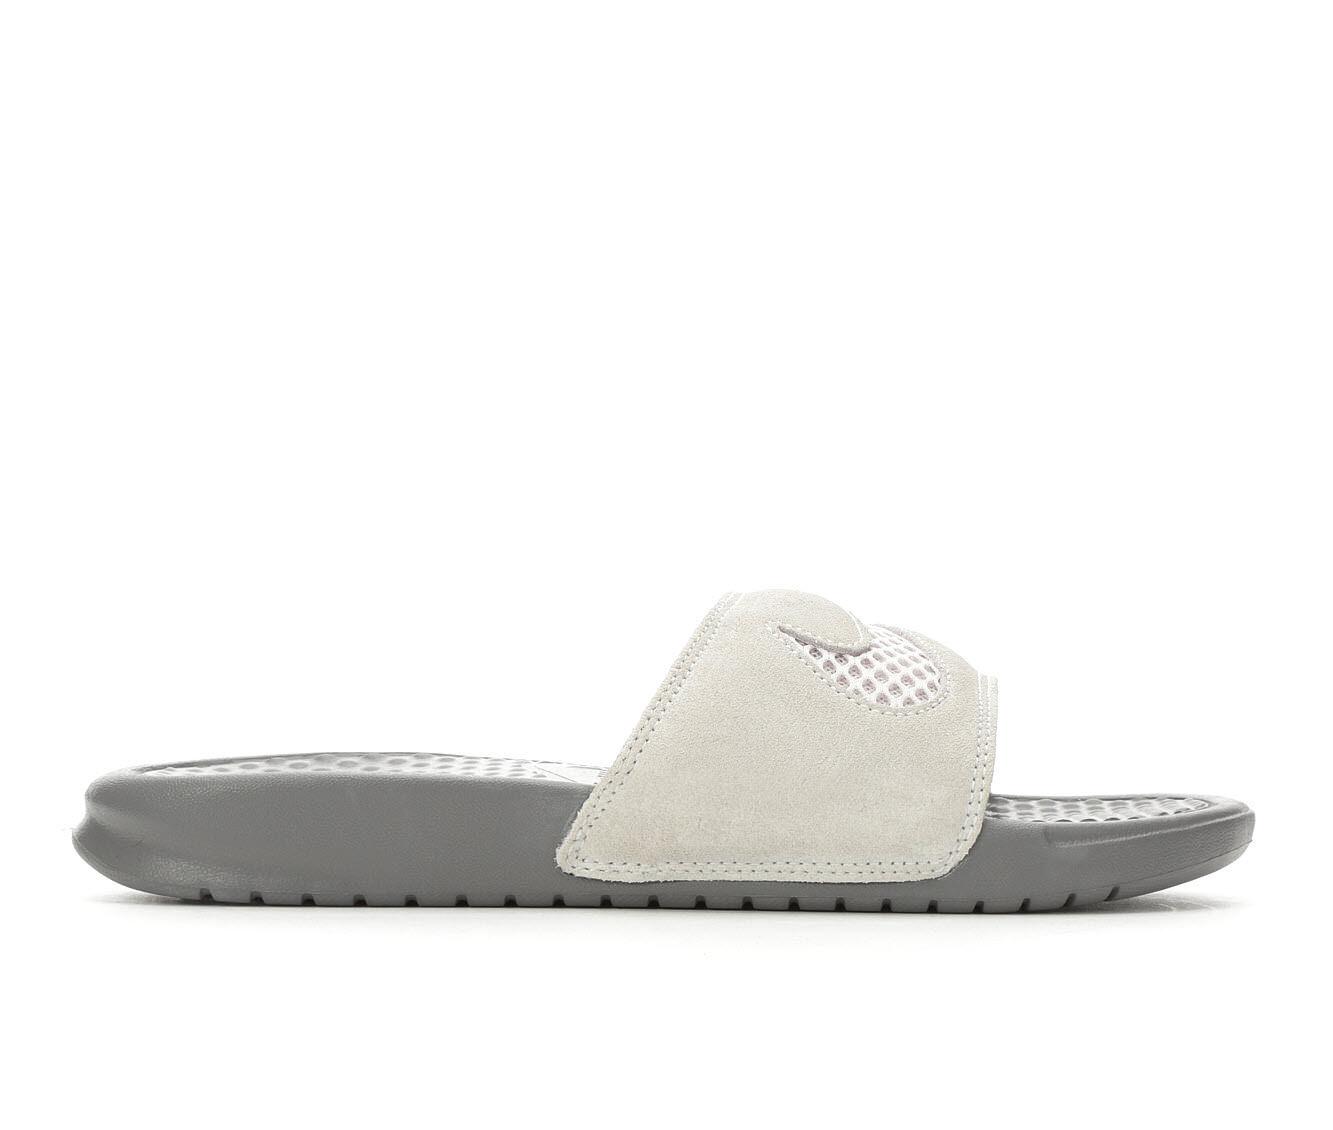 Women's Nike Benassi JDI Suede Sport Sandals Vast Grey/Gunsm